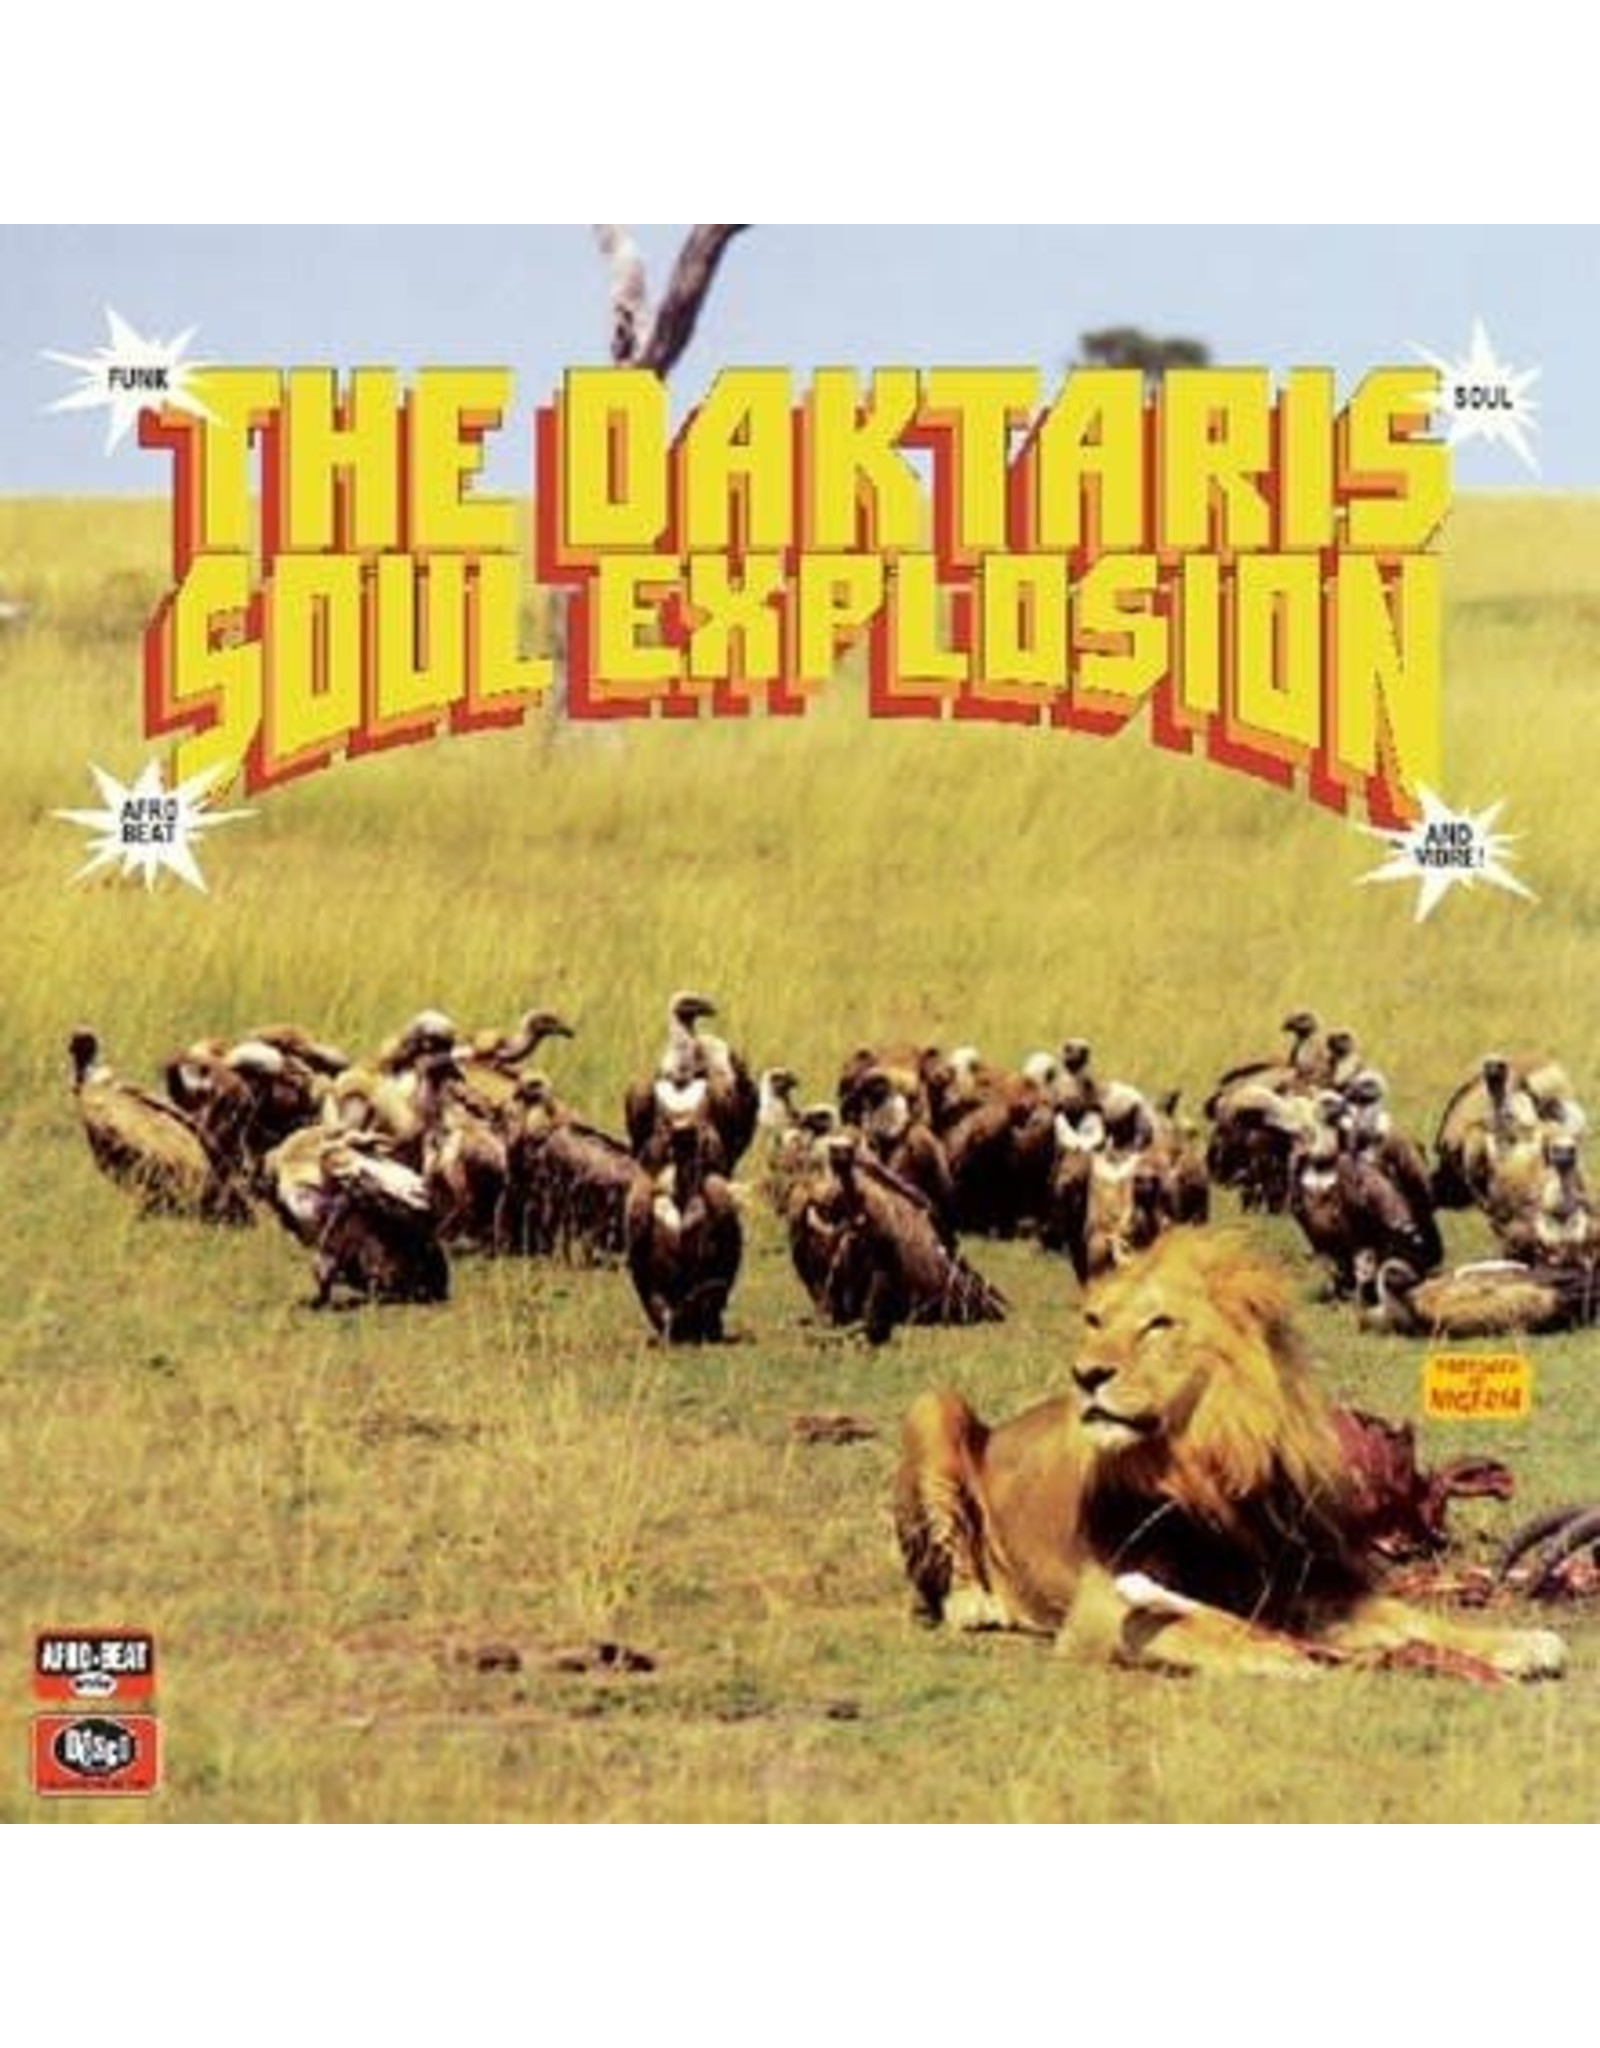 Daktaris: Soul Explosion LP